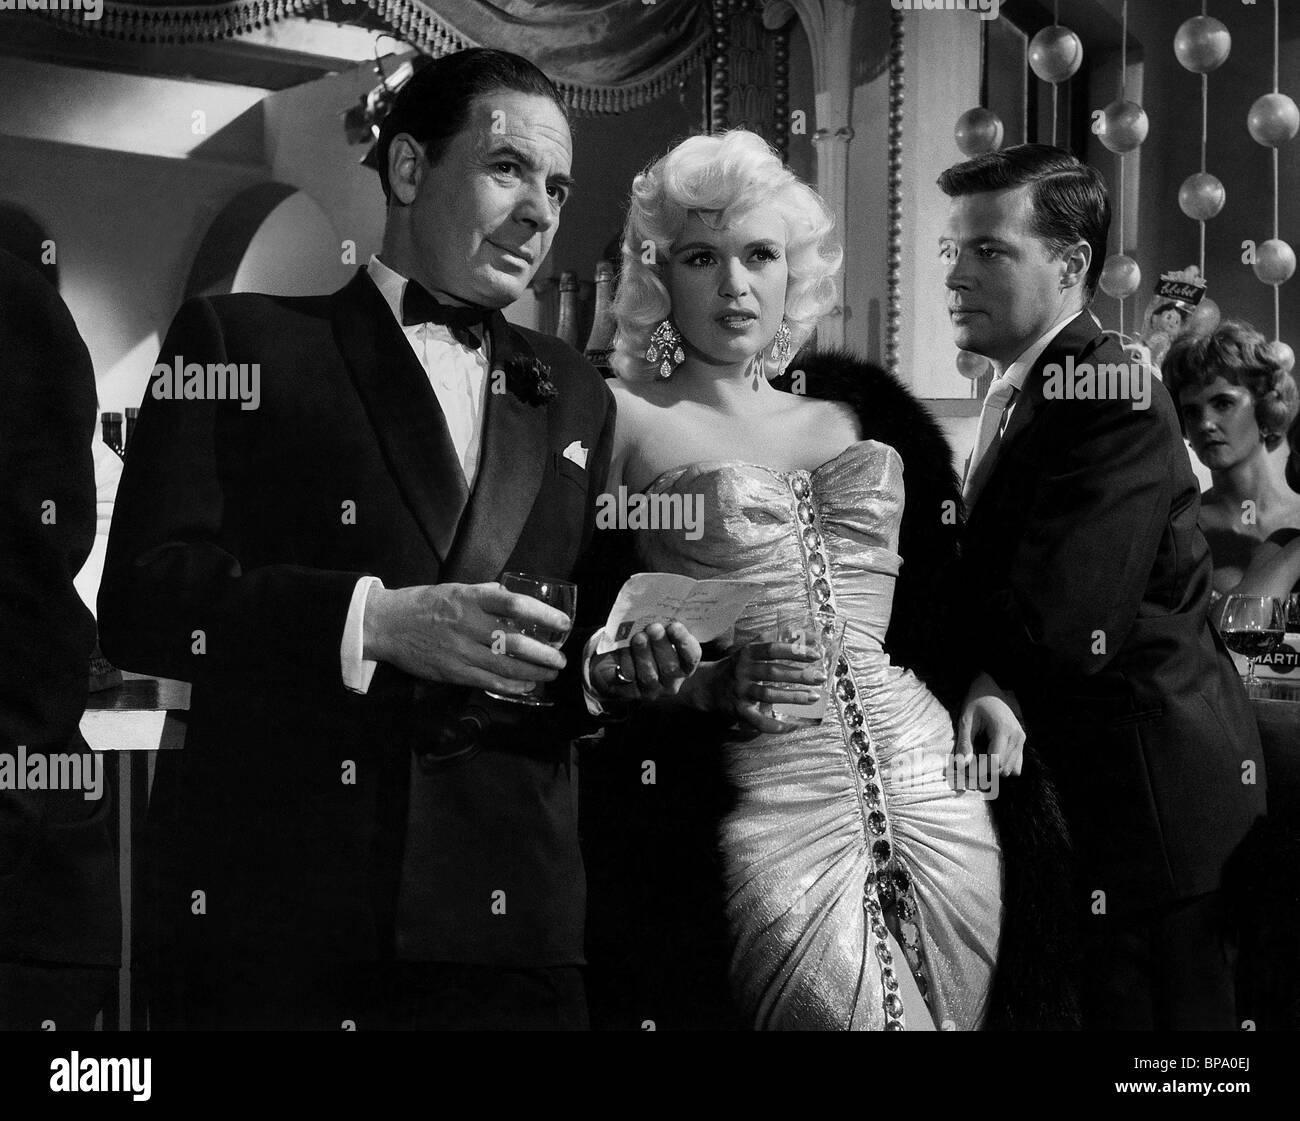 Leo genn jayne mansfield karlheinz bohm too hot to handle 1960 stock image